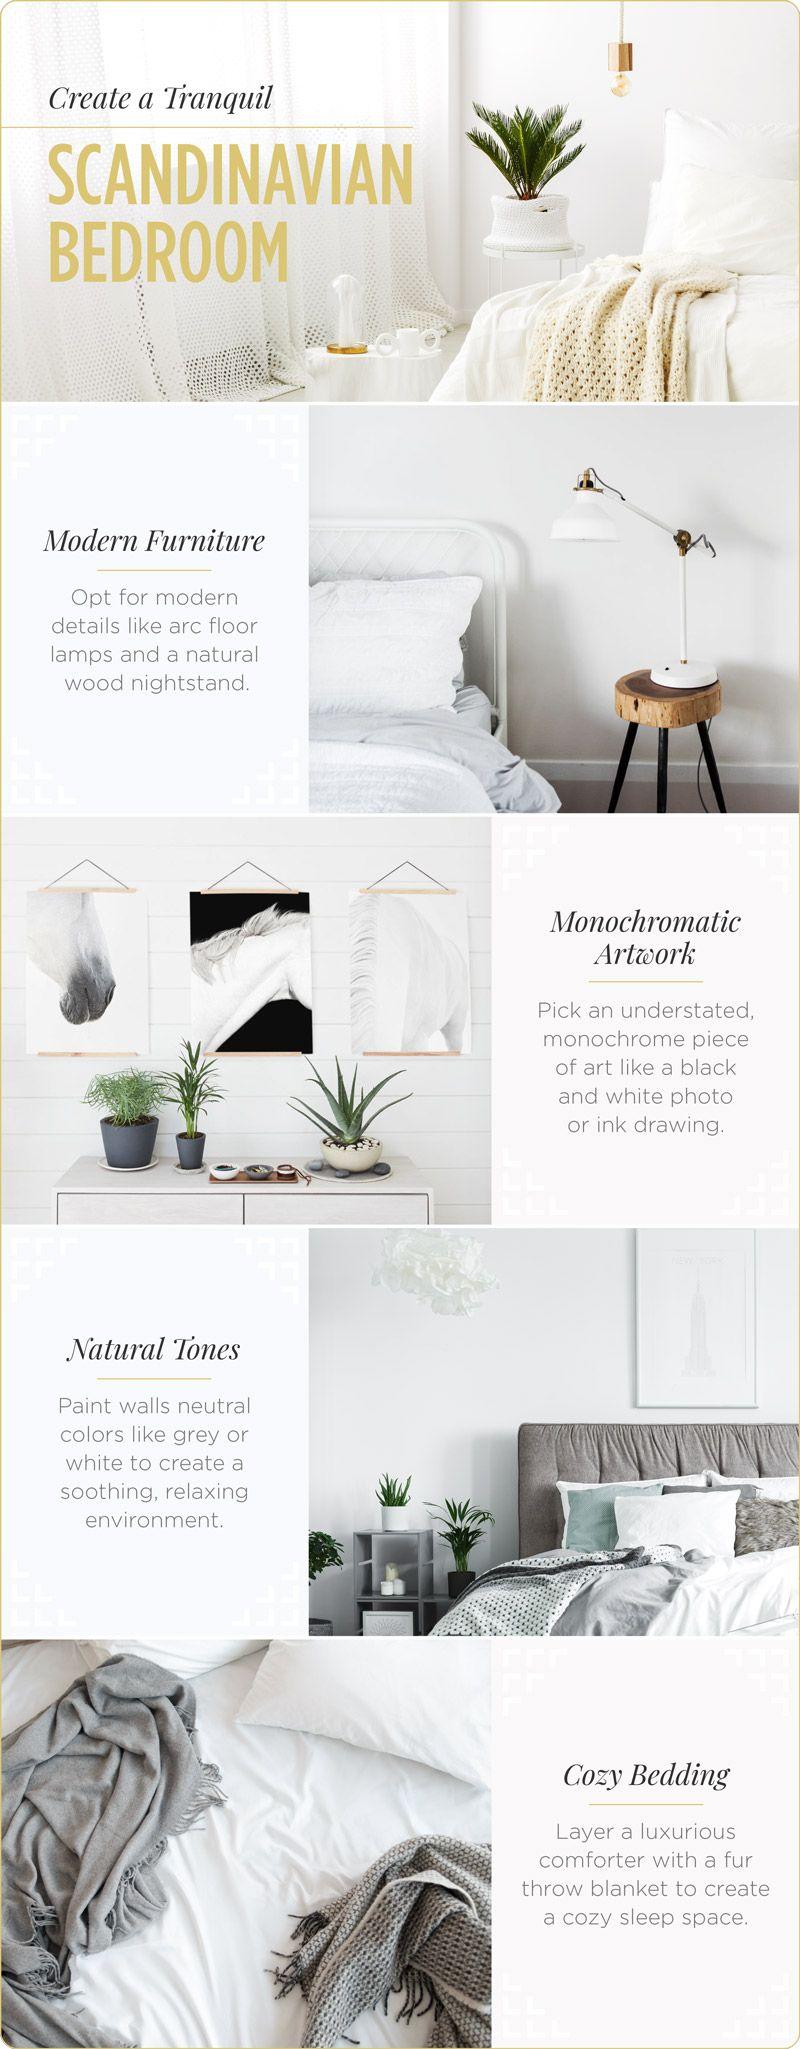 7 Scandinavian Design Principles And How To Use Them Scandinavian Interior Design Bedroom Inspiration Scandinavian Interior Design Styles